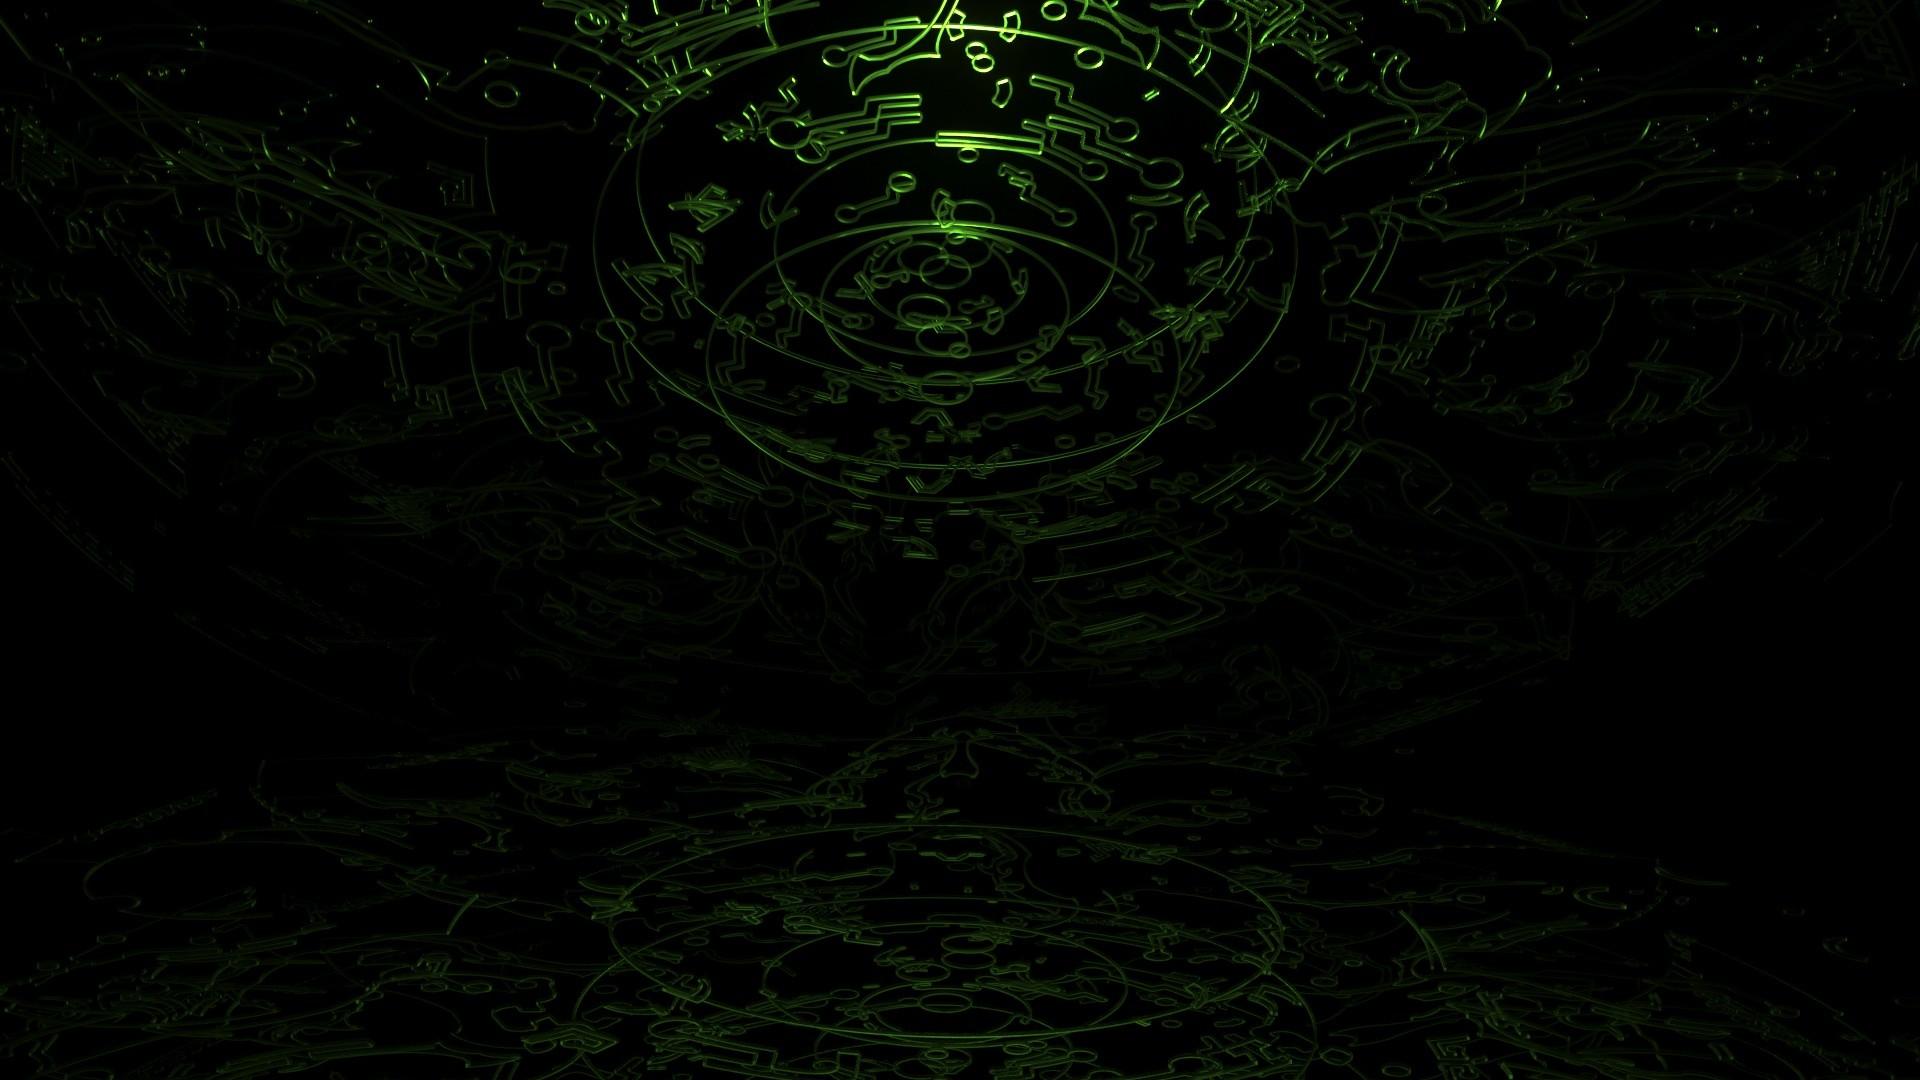 Kresimir jelusic robob3ar modem 31 freestyle green